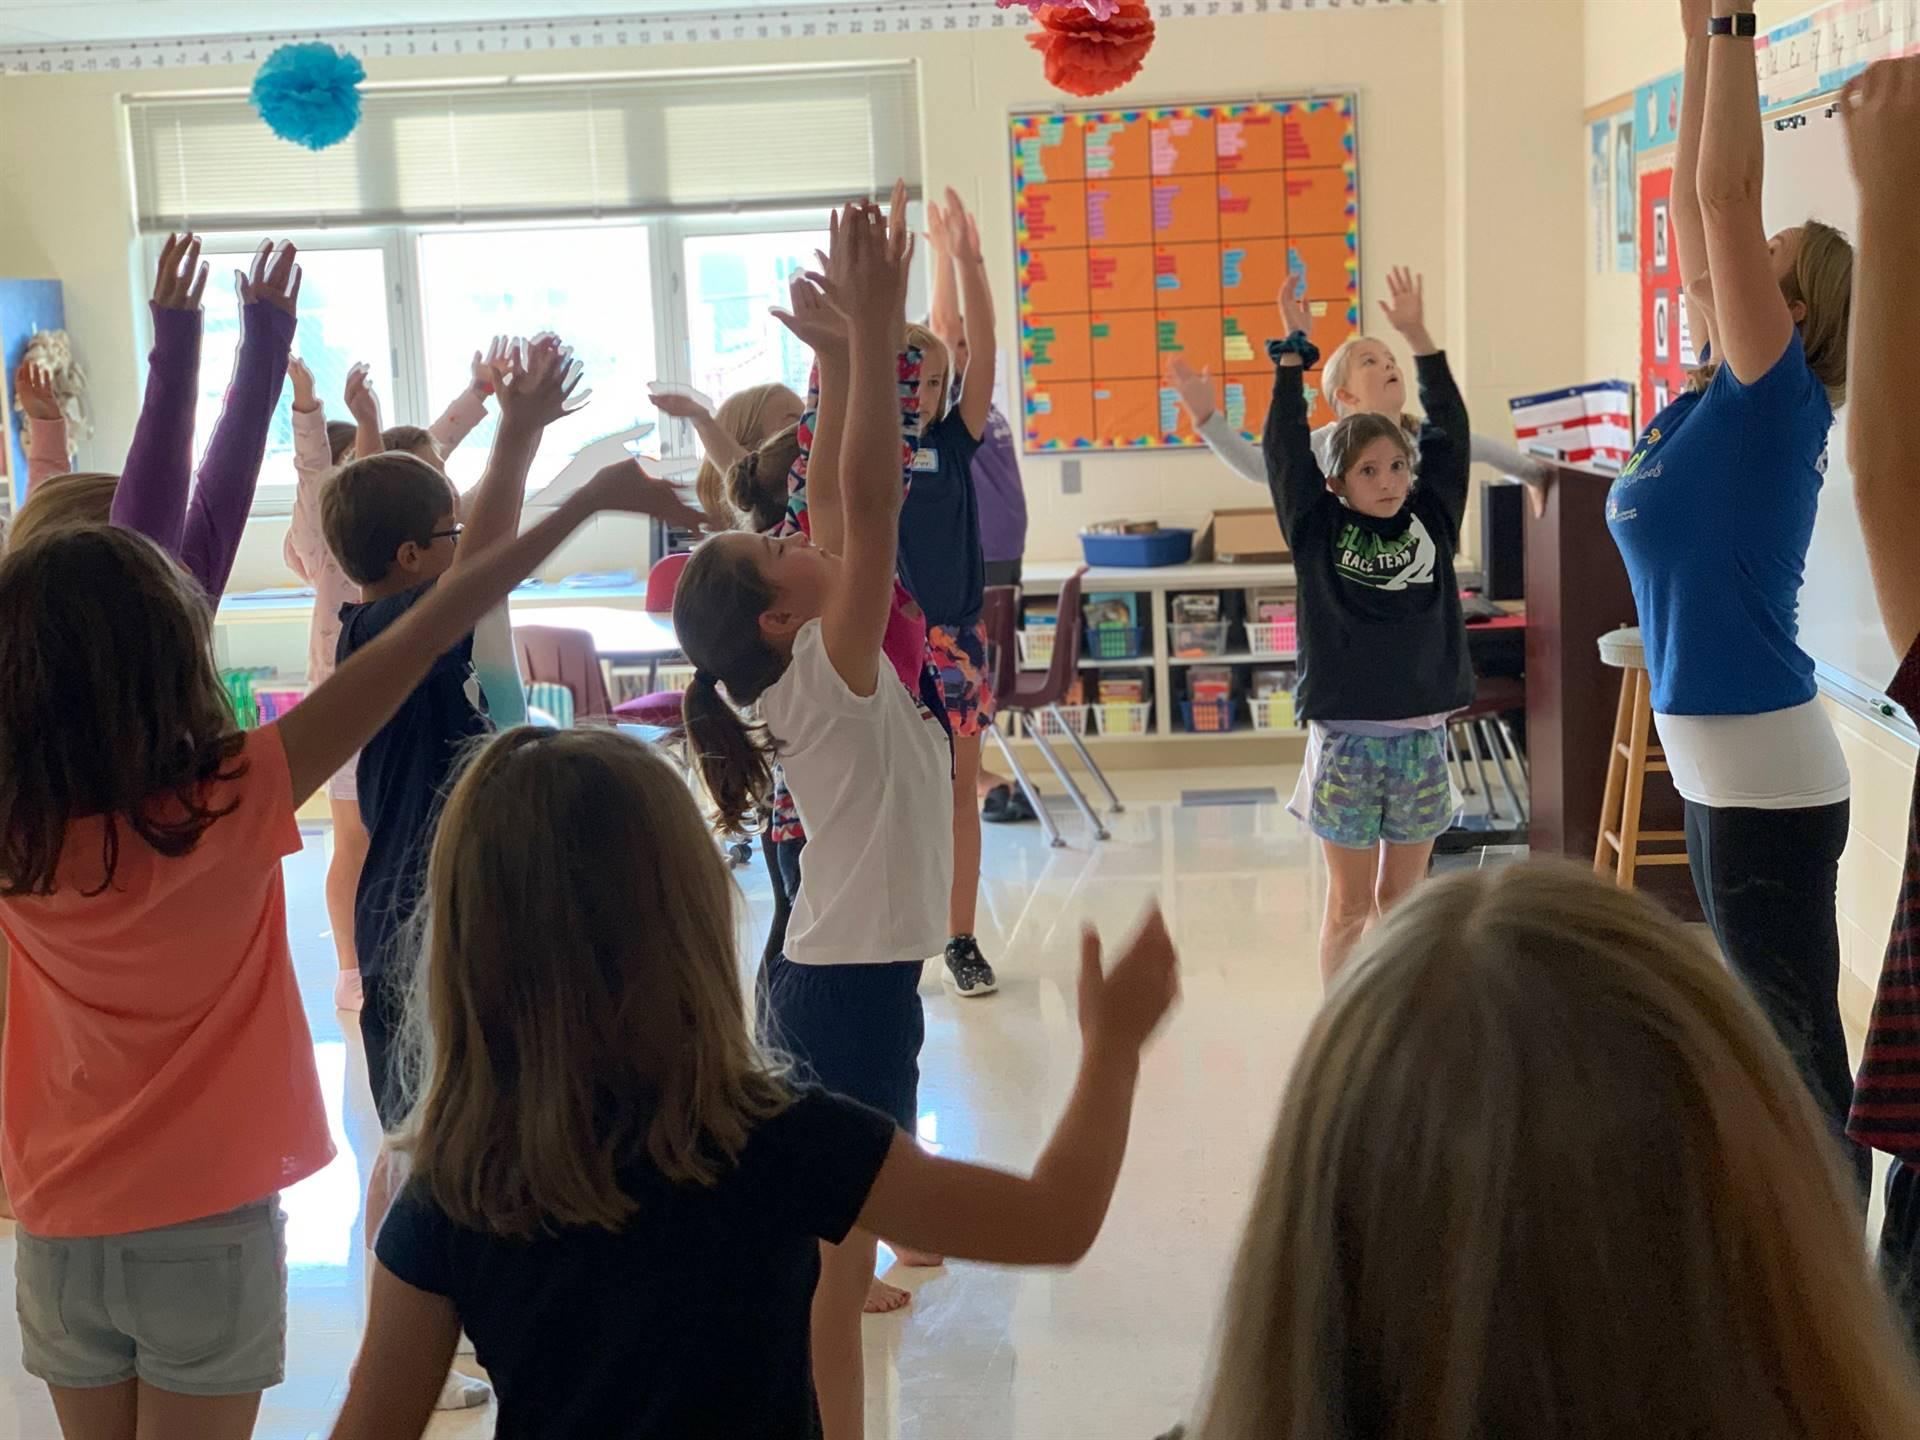 Students learning yoga